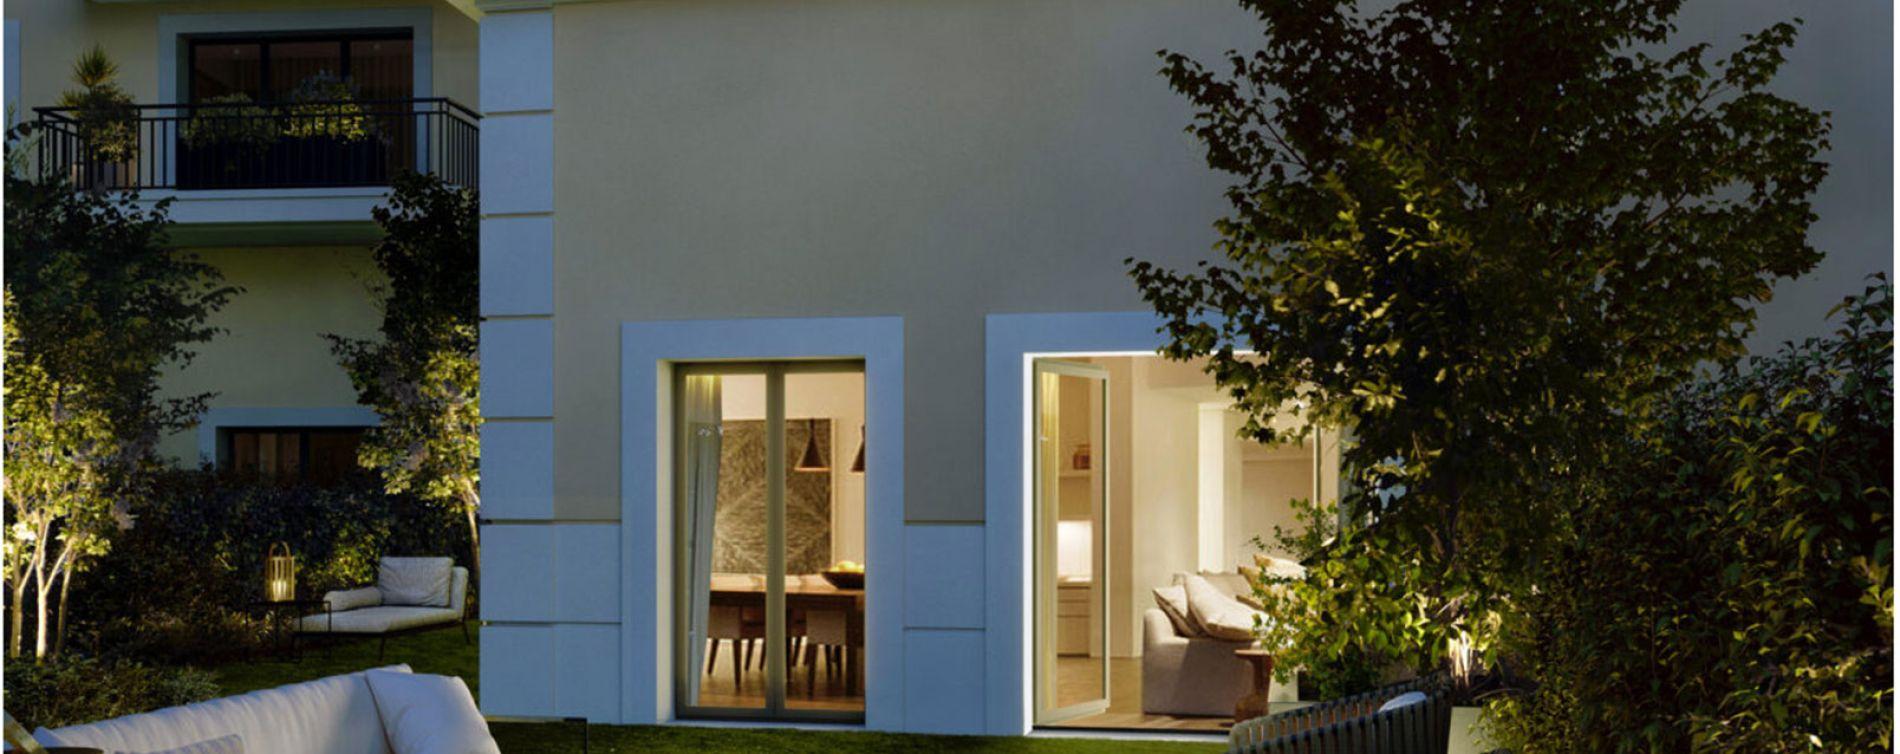 Le Blanc-Mesnil : programme immobilier neuve « Programme immobilier n°219042 » en Loi Pinel (3)